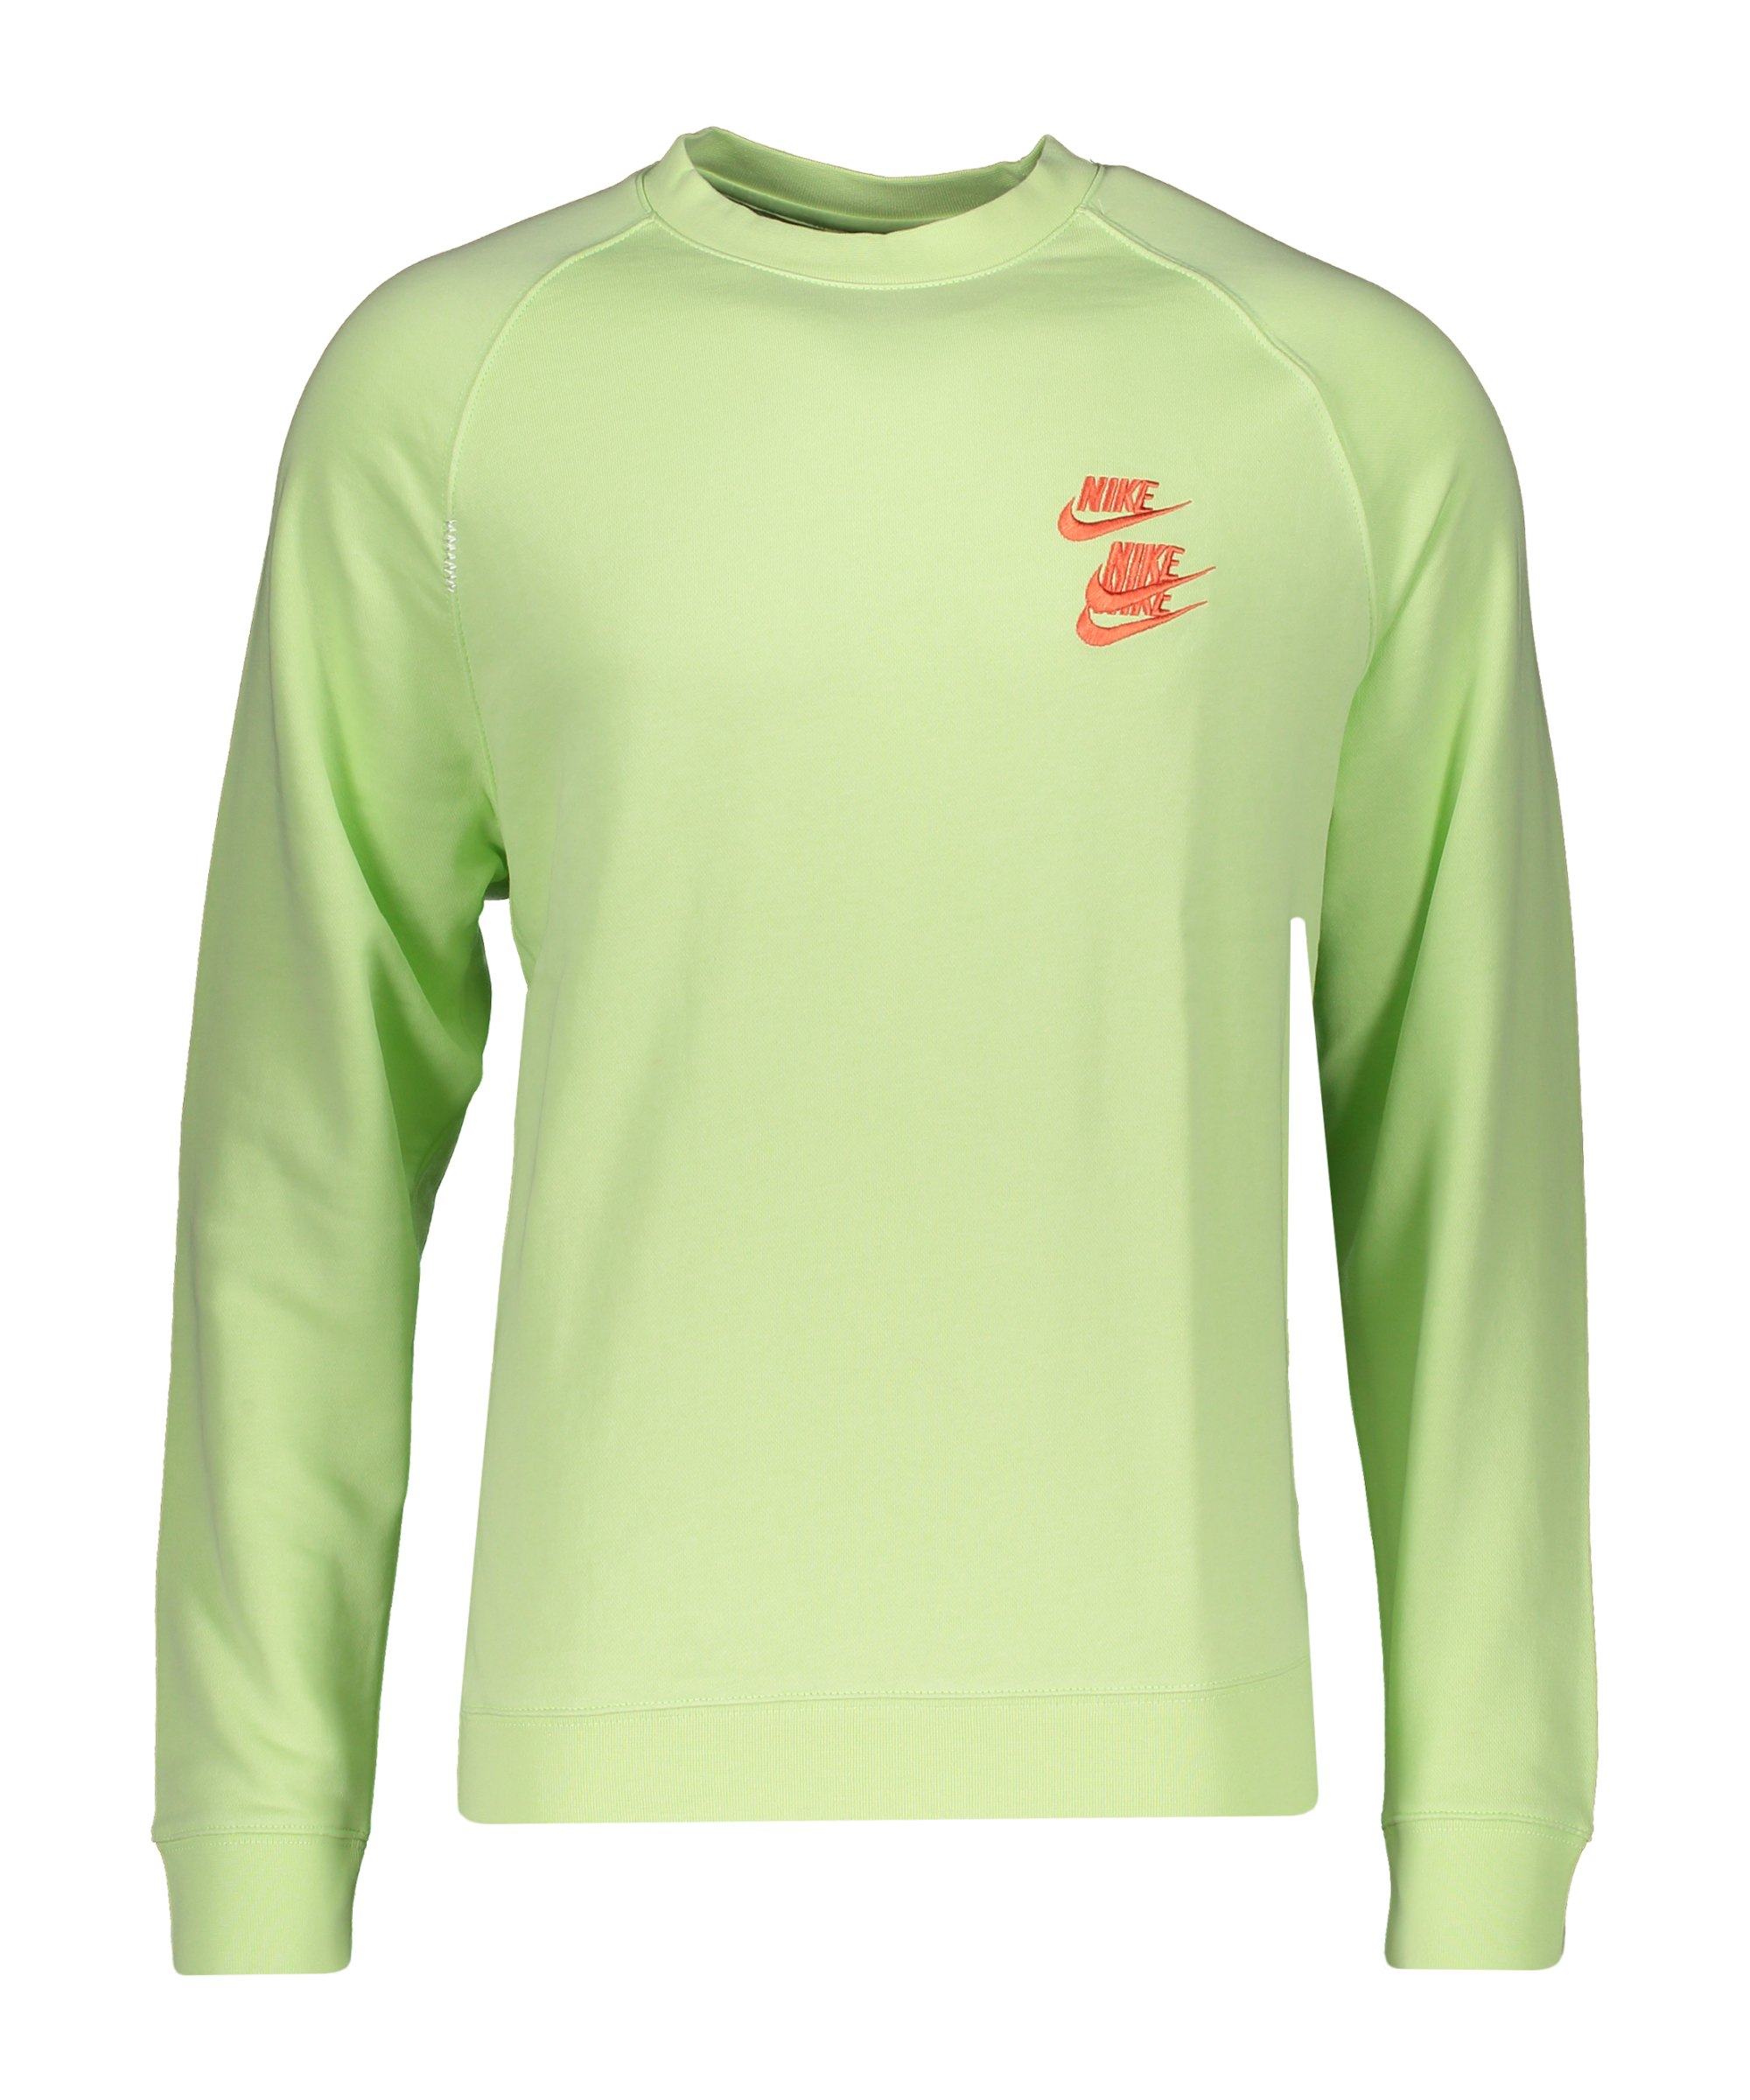 Nike World Tour Crew Sweatshirt Grün F383 - gruen